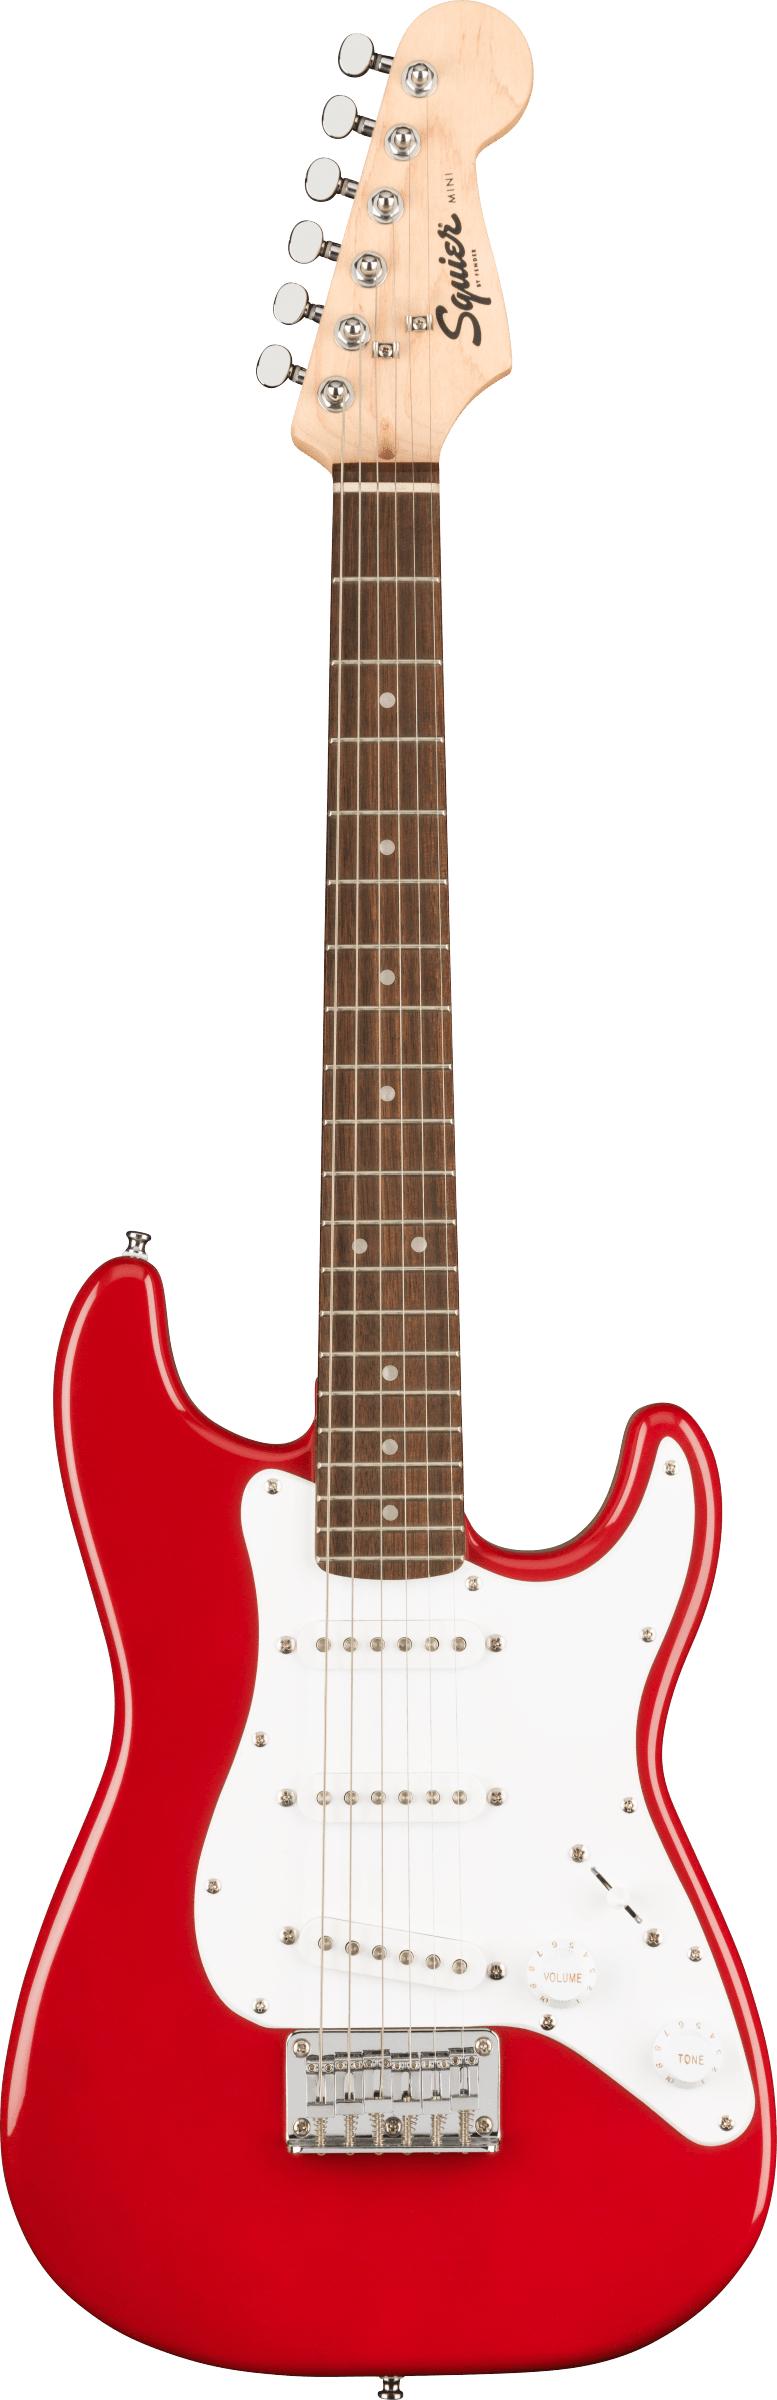 Squier Mini Stratocaster, Laurel Fingerboard - Dakota Red